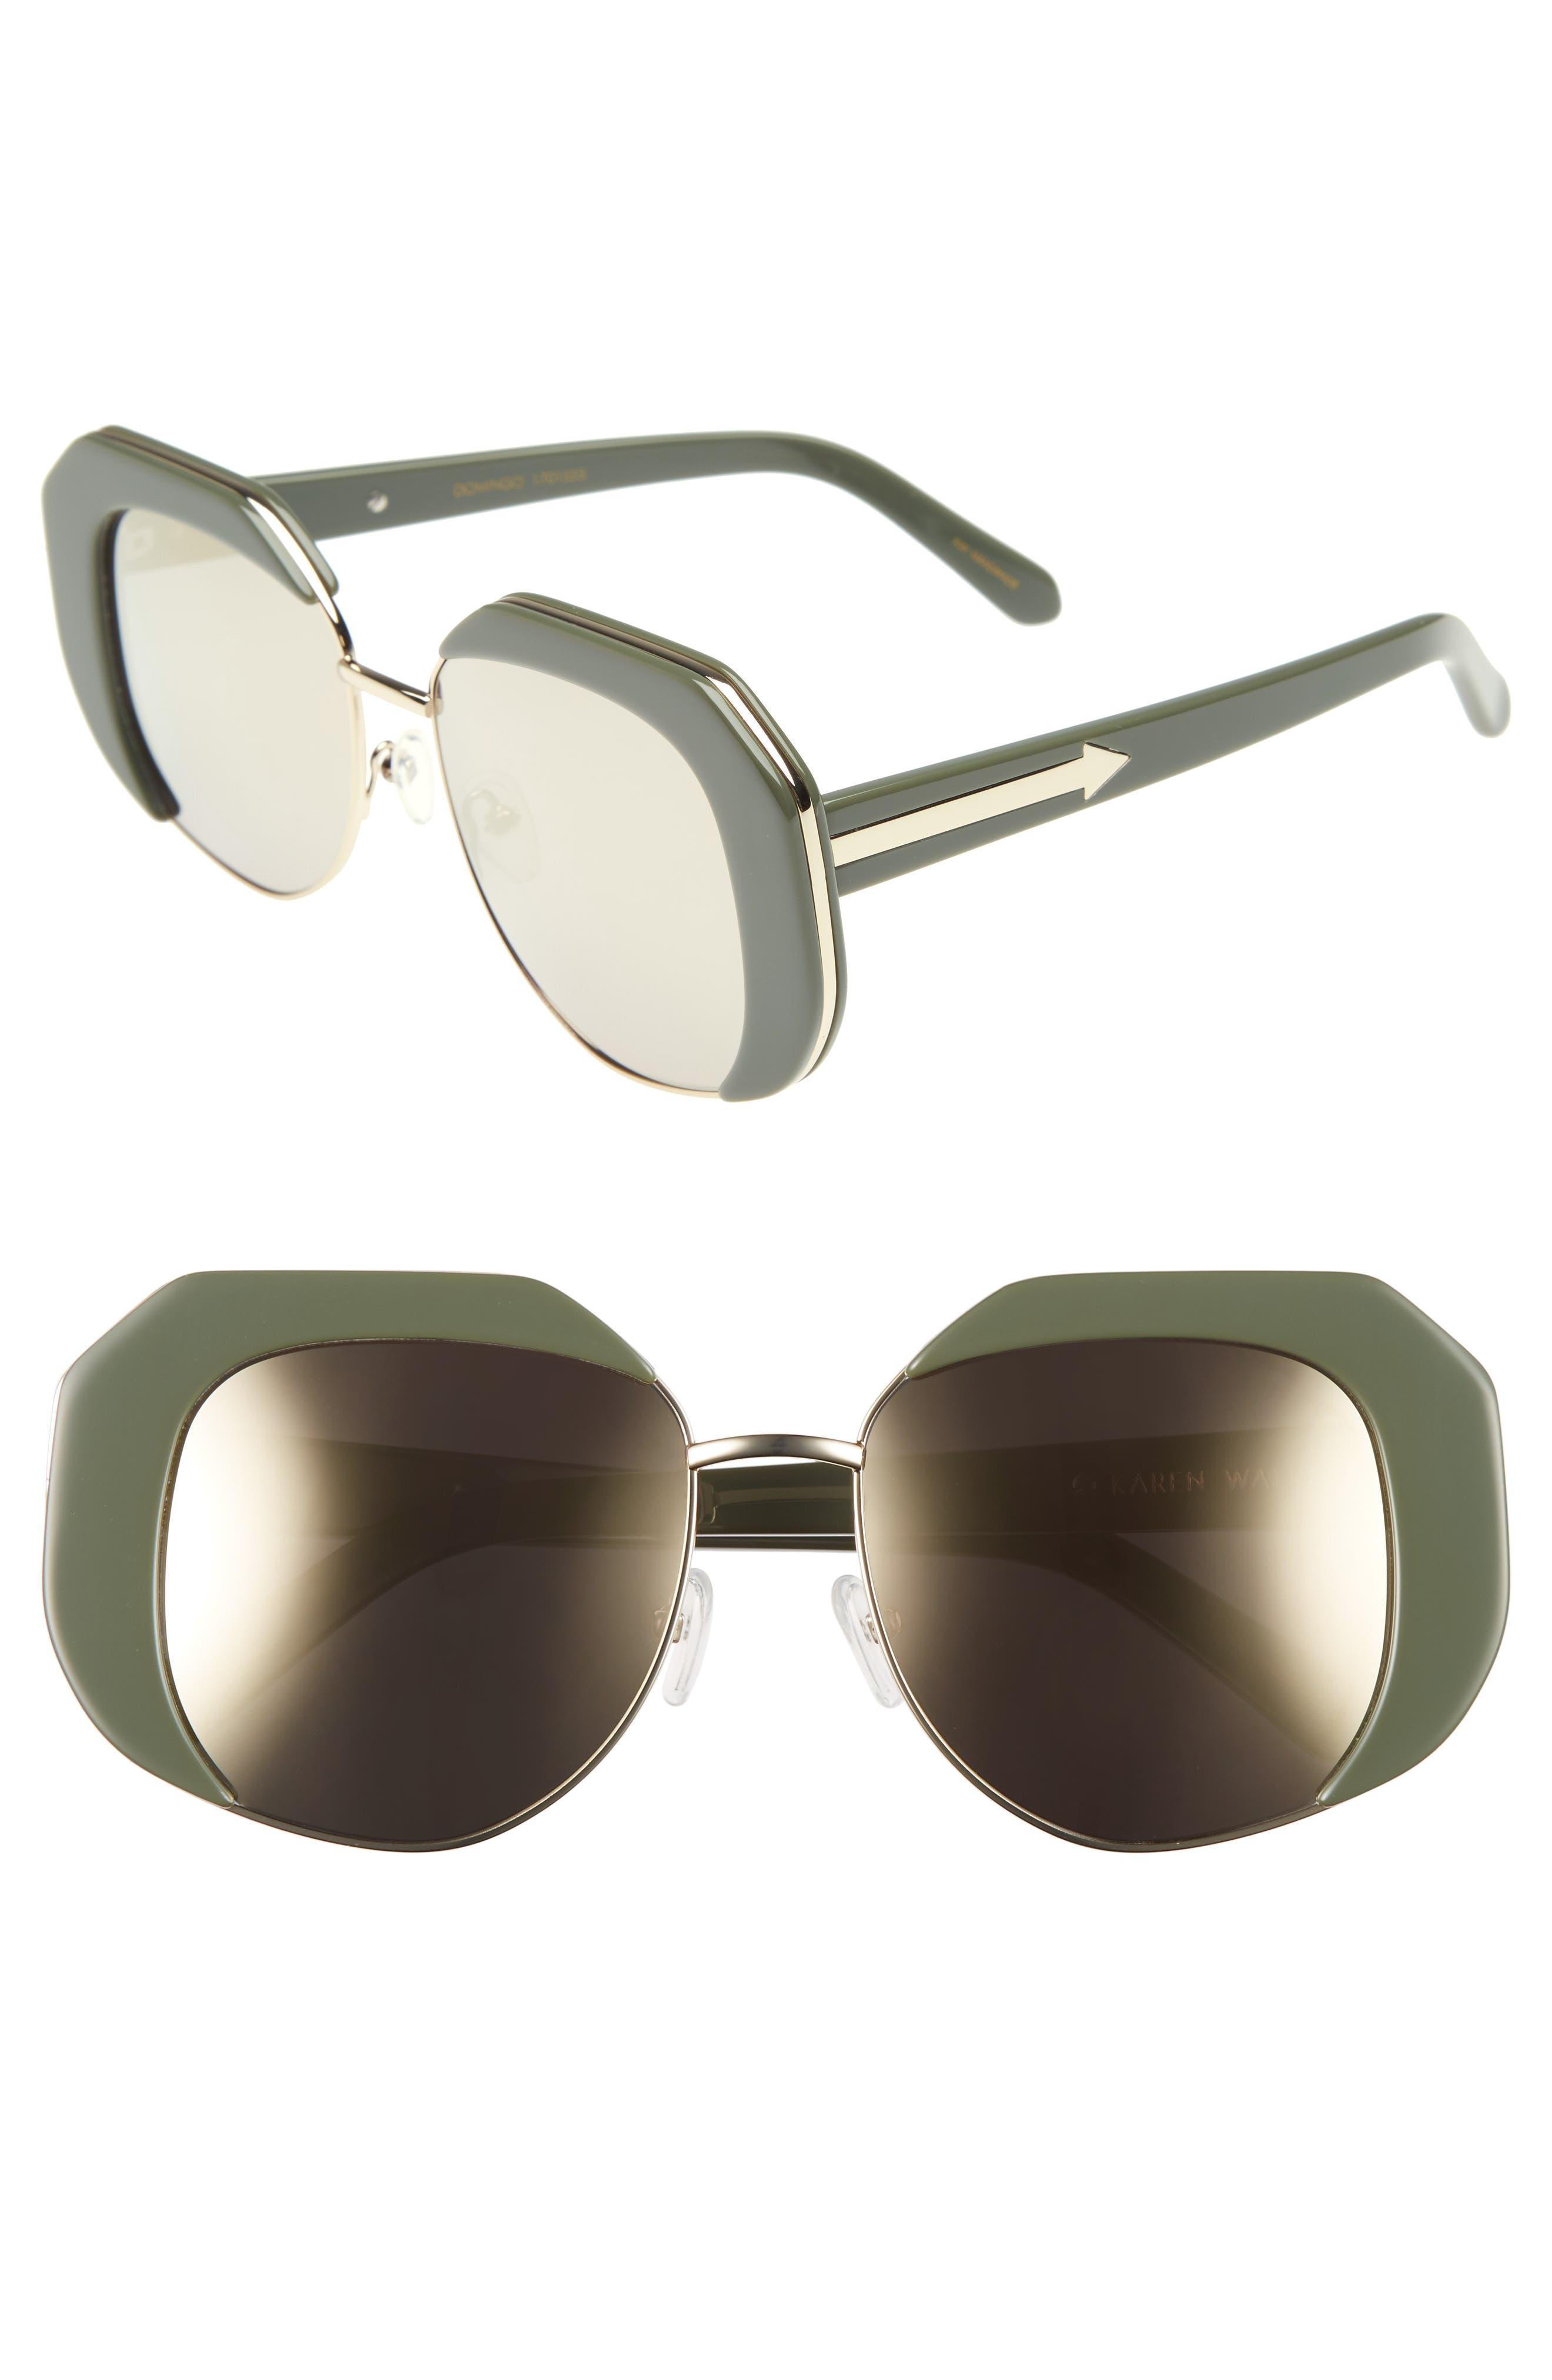 Domingo 52mm Sunglasses,                             Main thumbnail 1, color,                             Khaki/ Gold